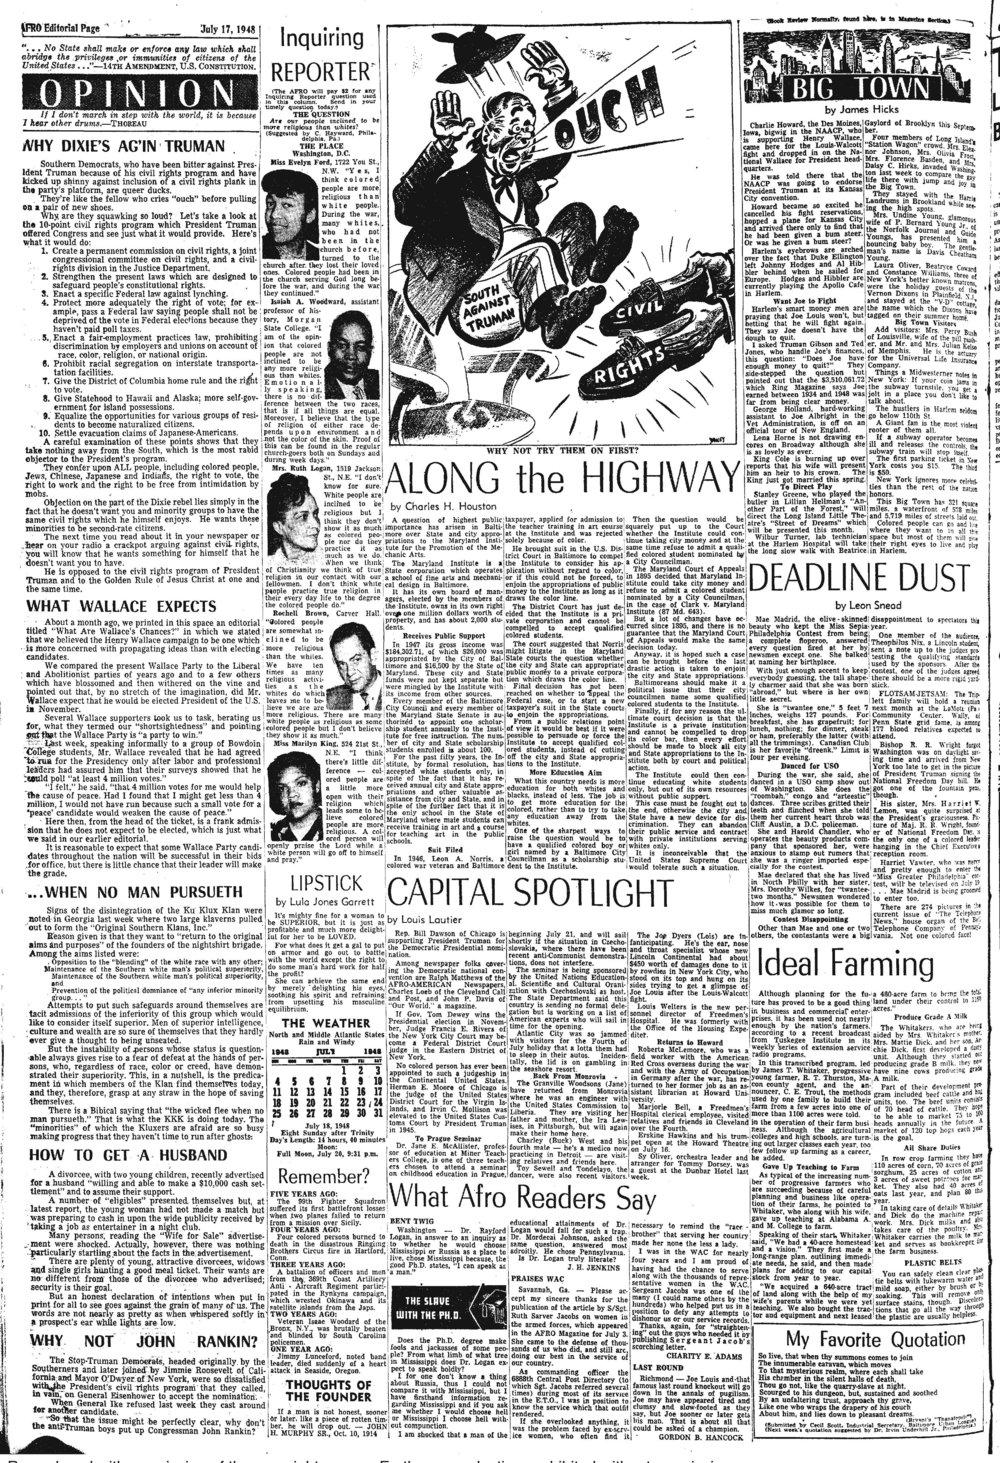 1948-7-17-ALONG_the_HIGHWAY.jpg